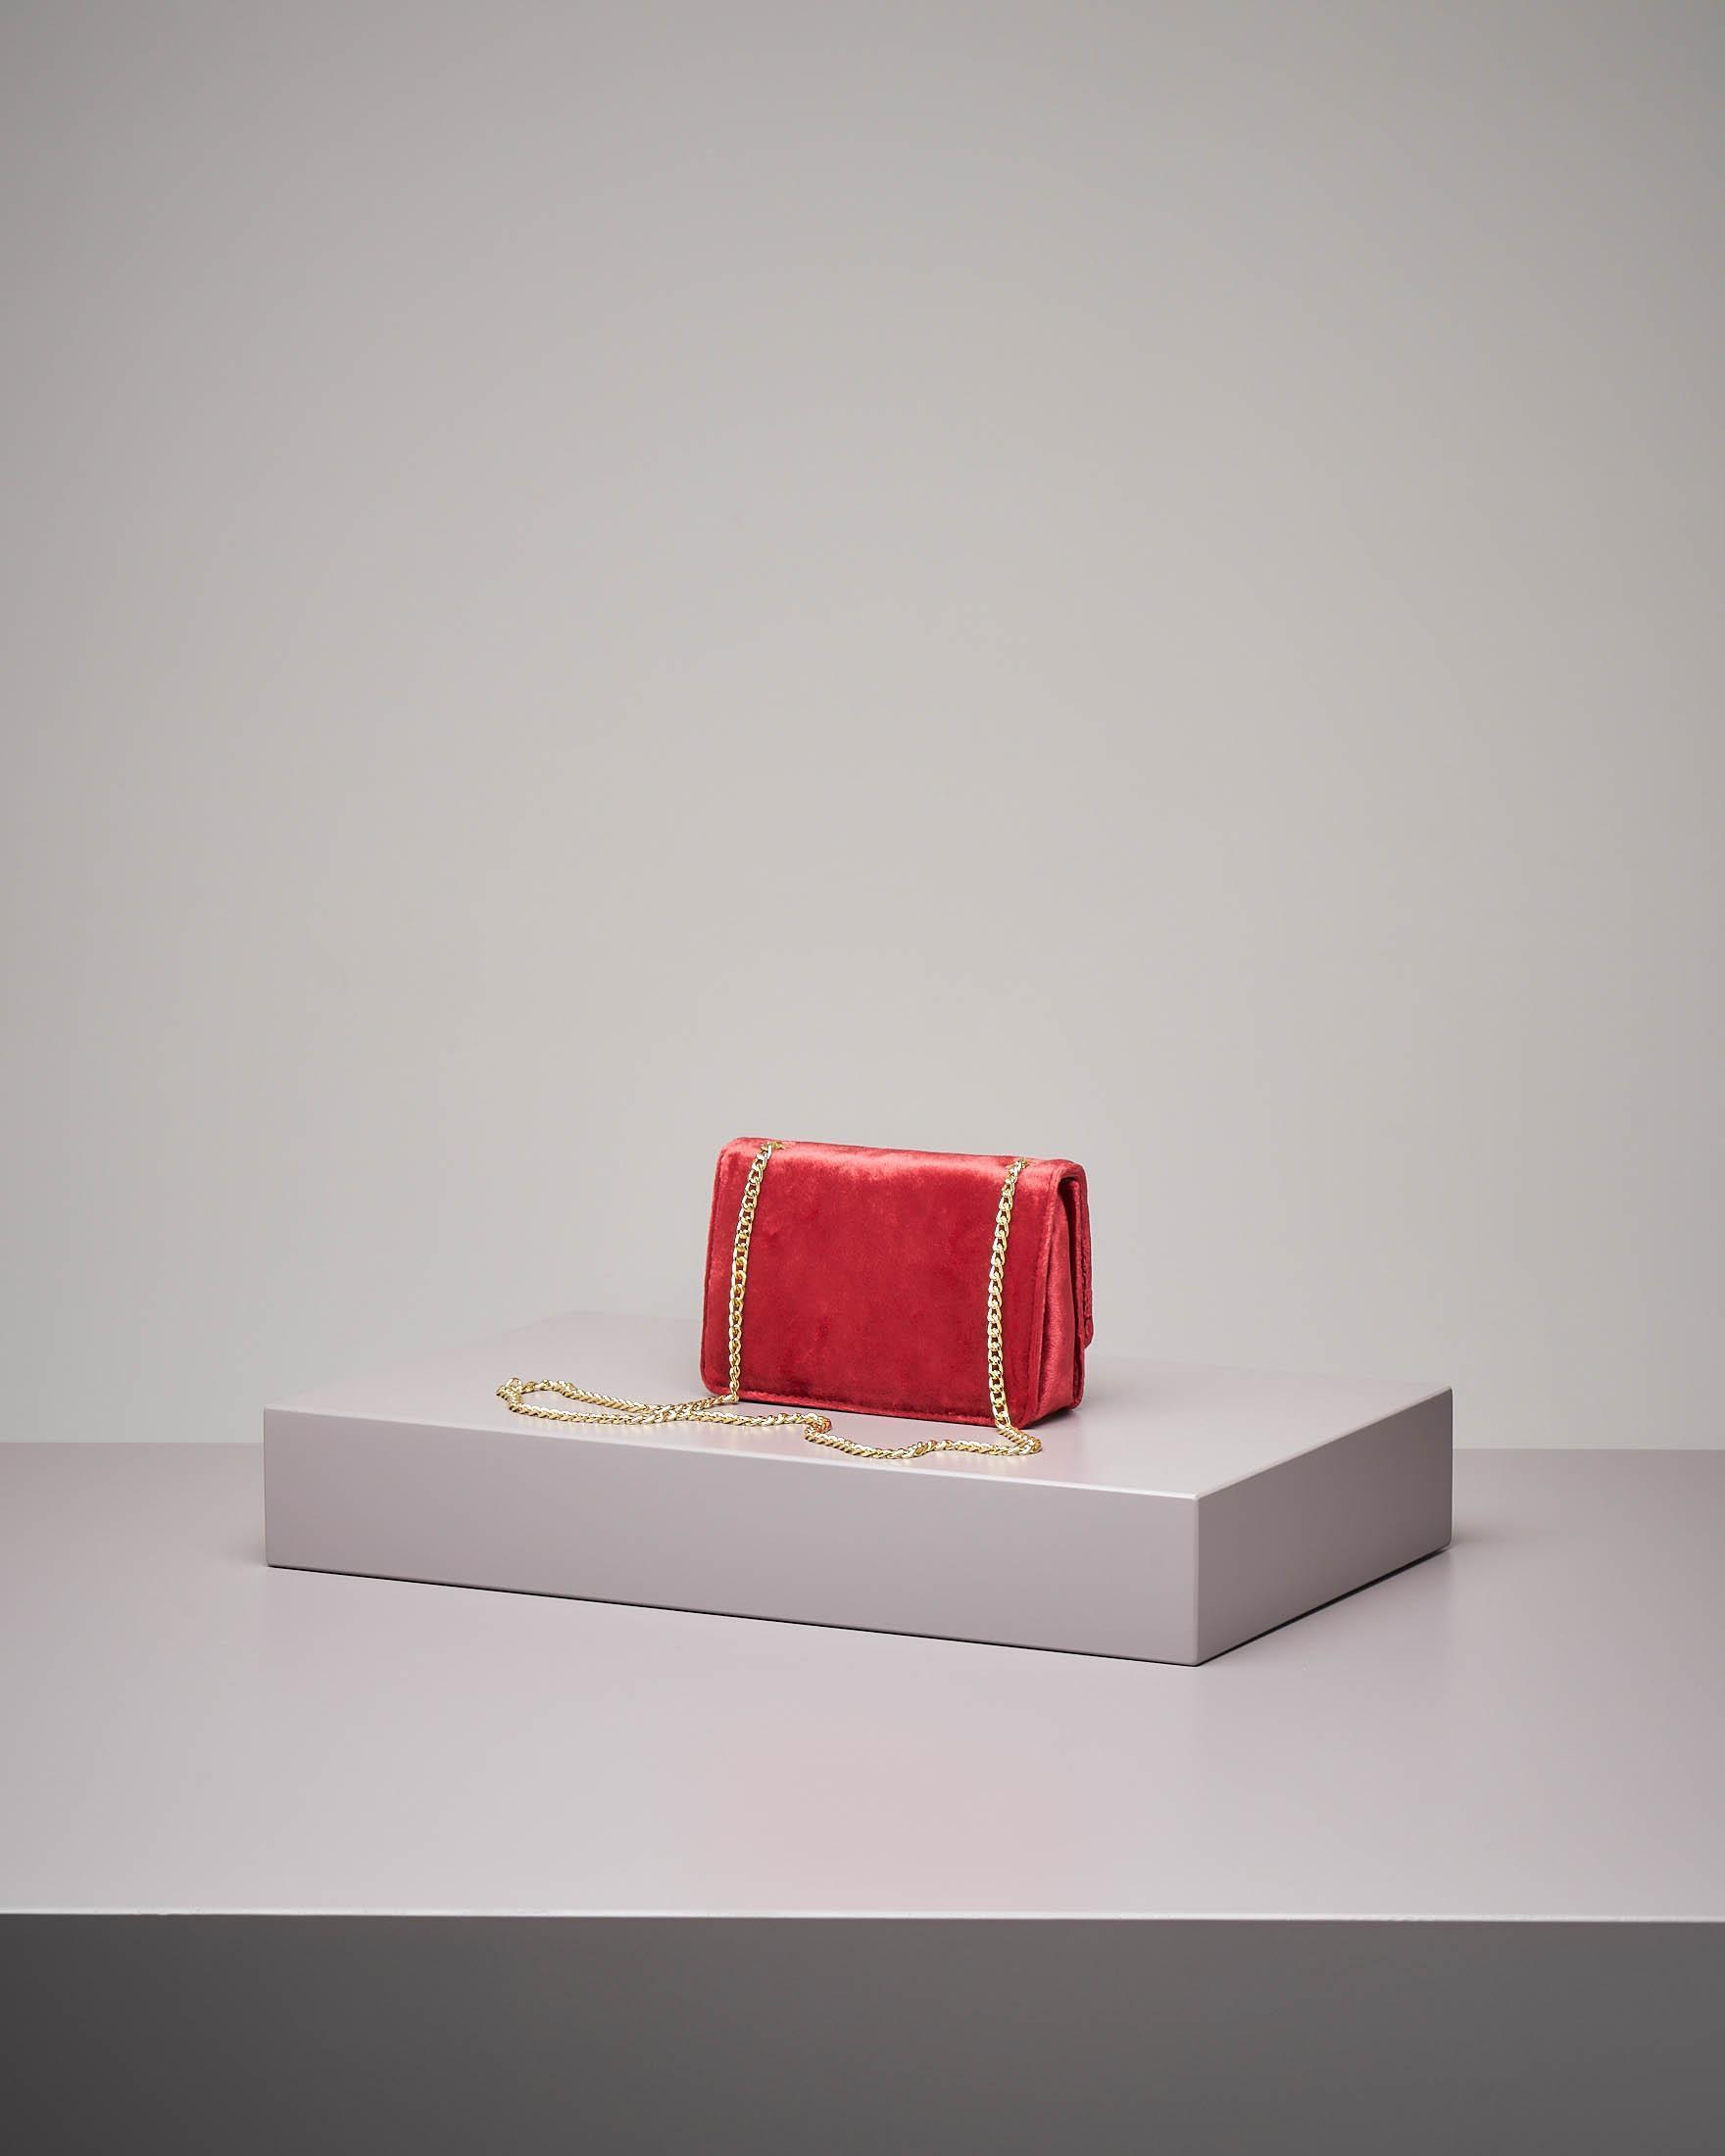 Borsa rossa velluto e borchie